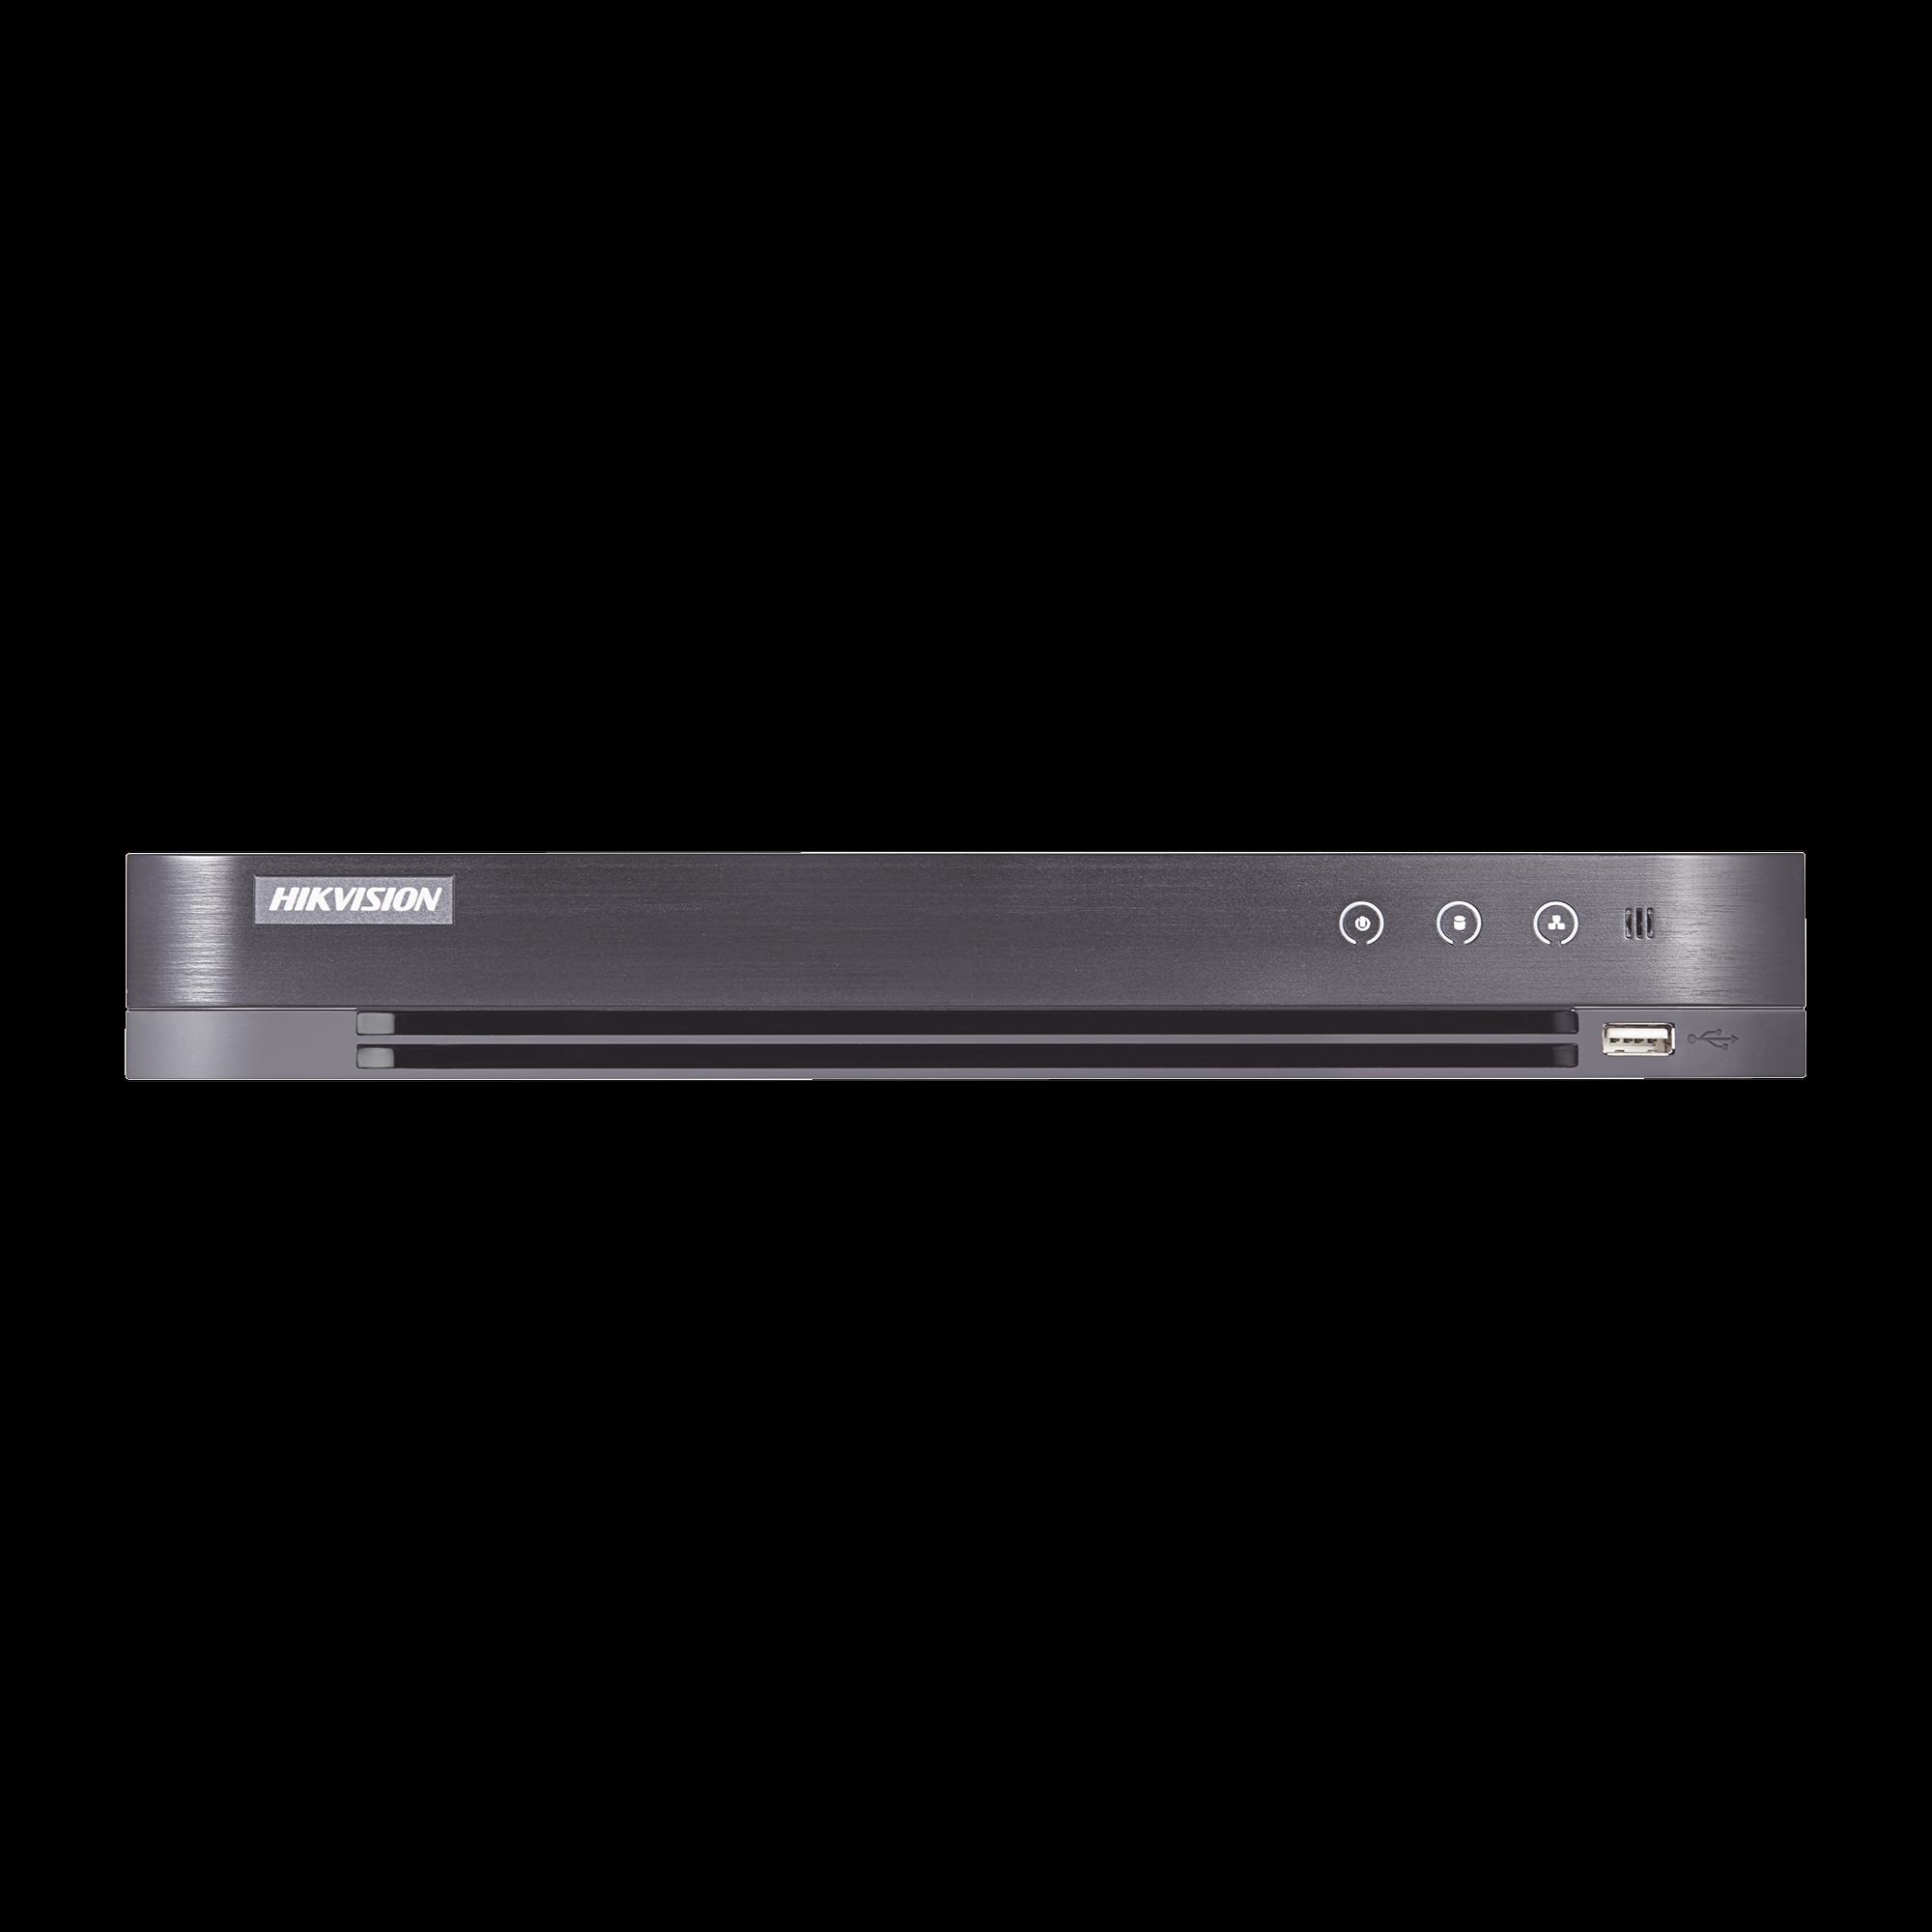 DVR 3 Megapixel / 16 Canales TURBOHD + 8 Canales IP / 1 Bahía de Disco Duro / 1 Canal de Audio / Vídeo análisis